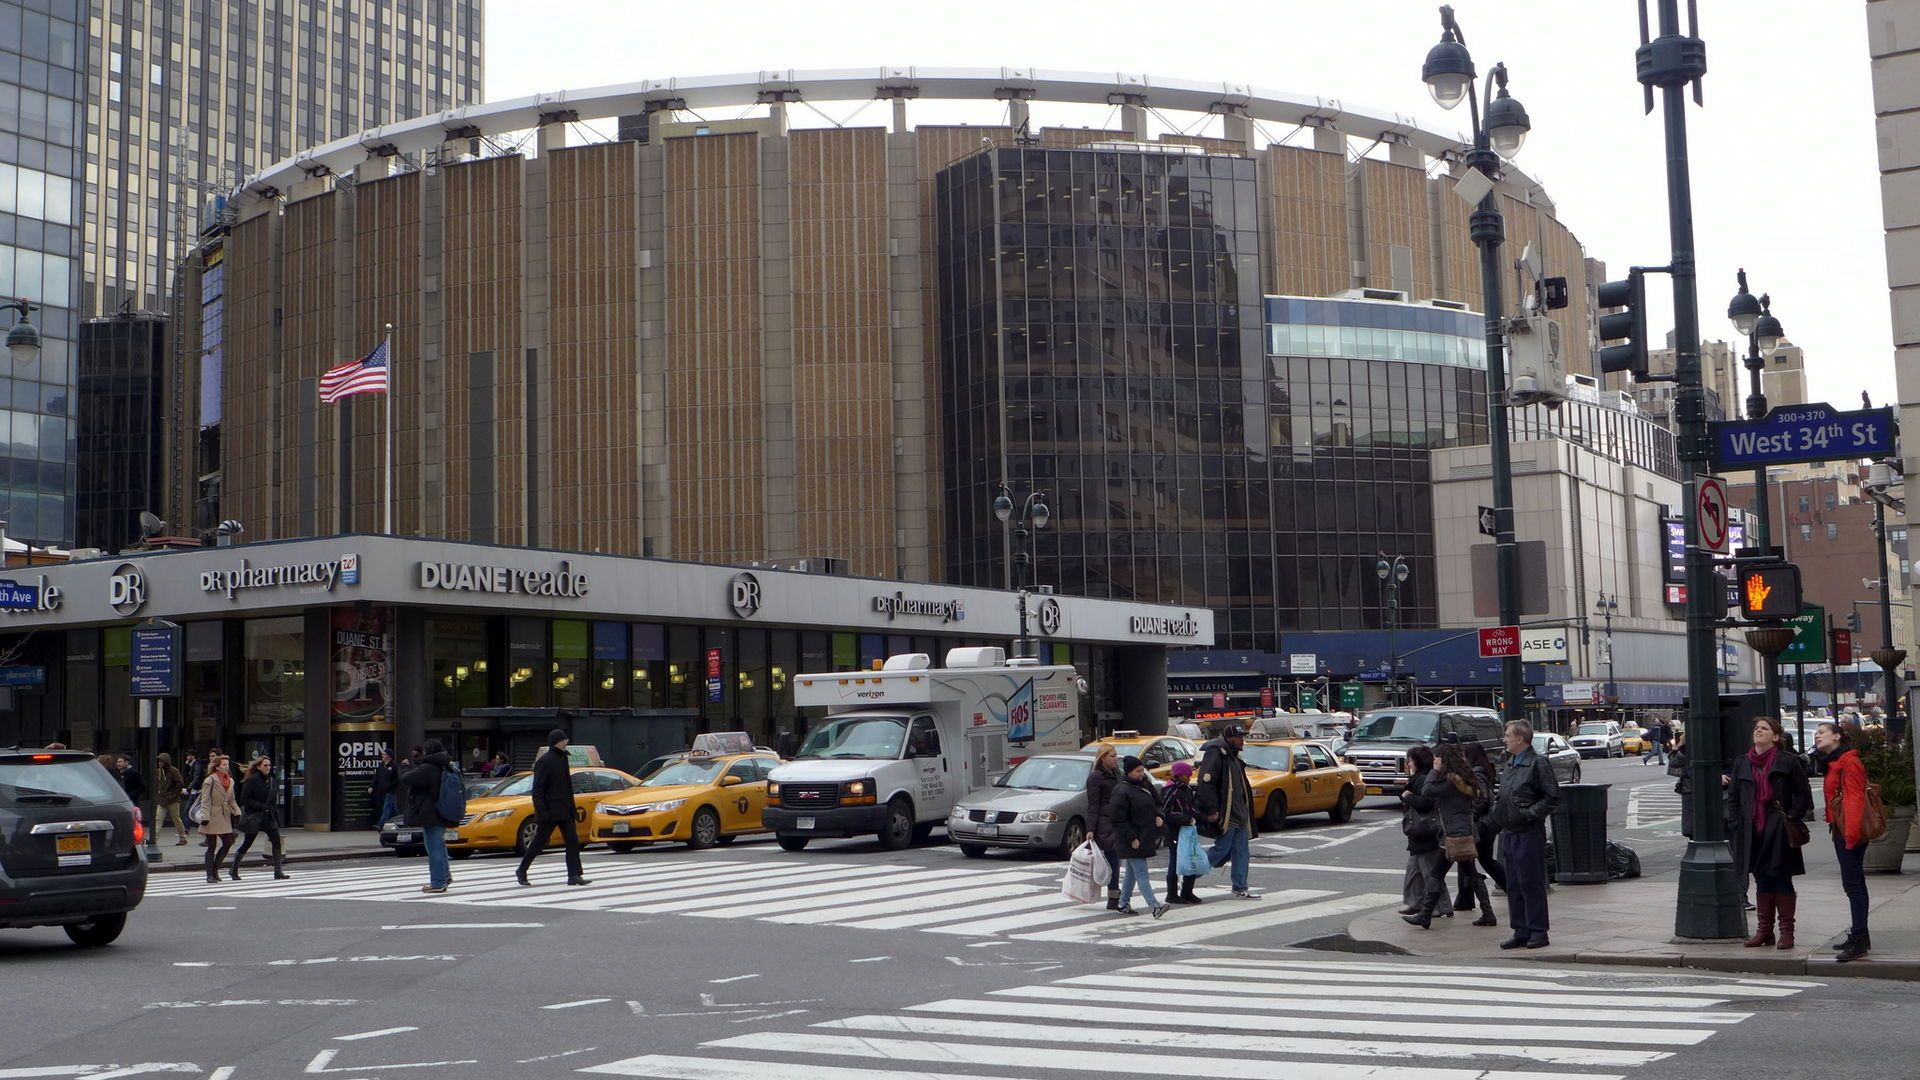 madison square garden - Madison Square Garden Internship